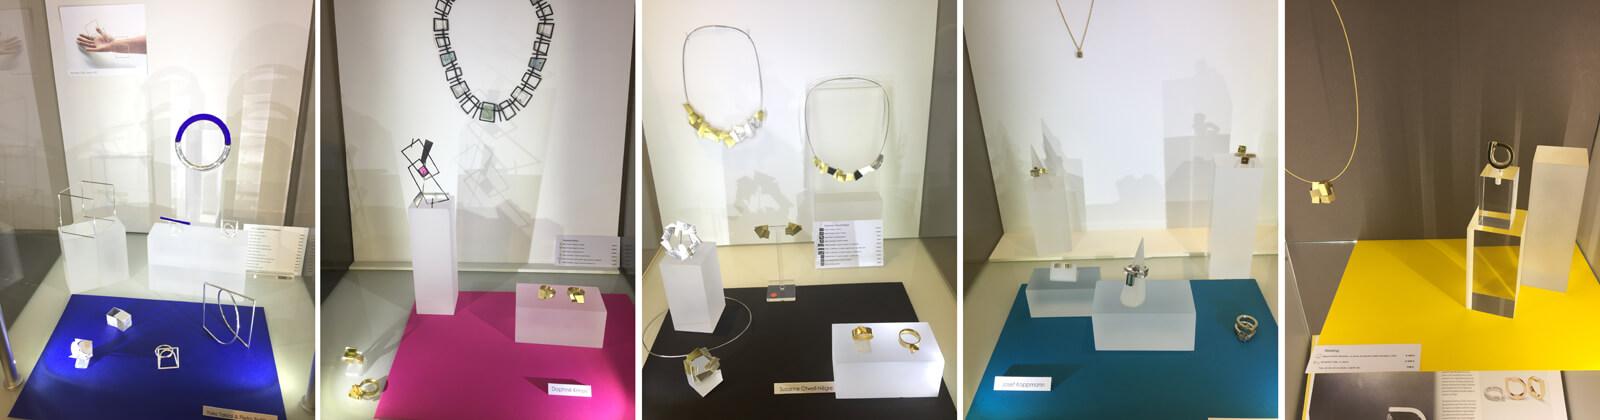 Opening Exposition BAUHAUS vernissage vitrines